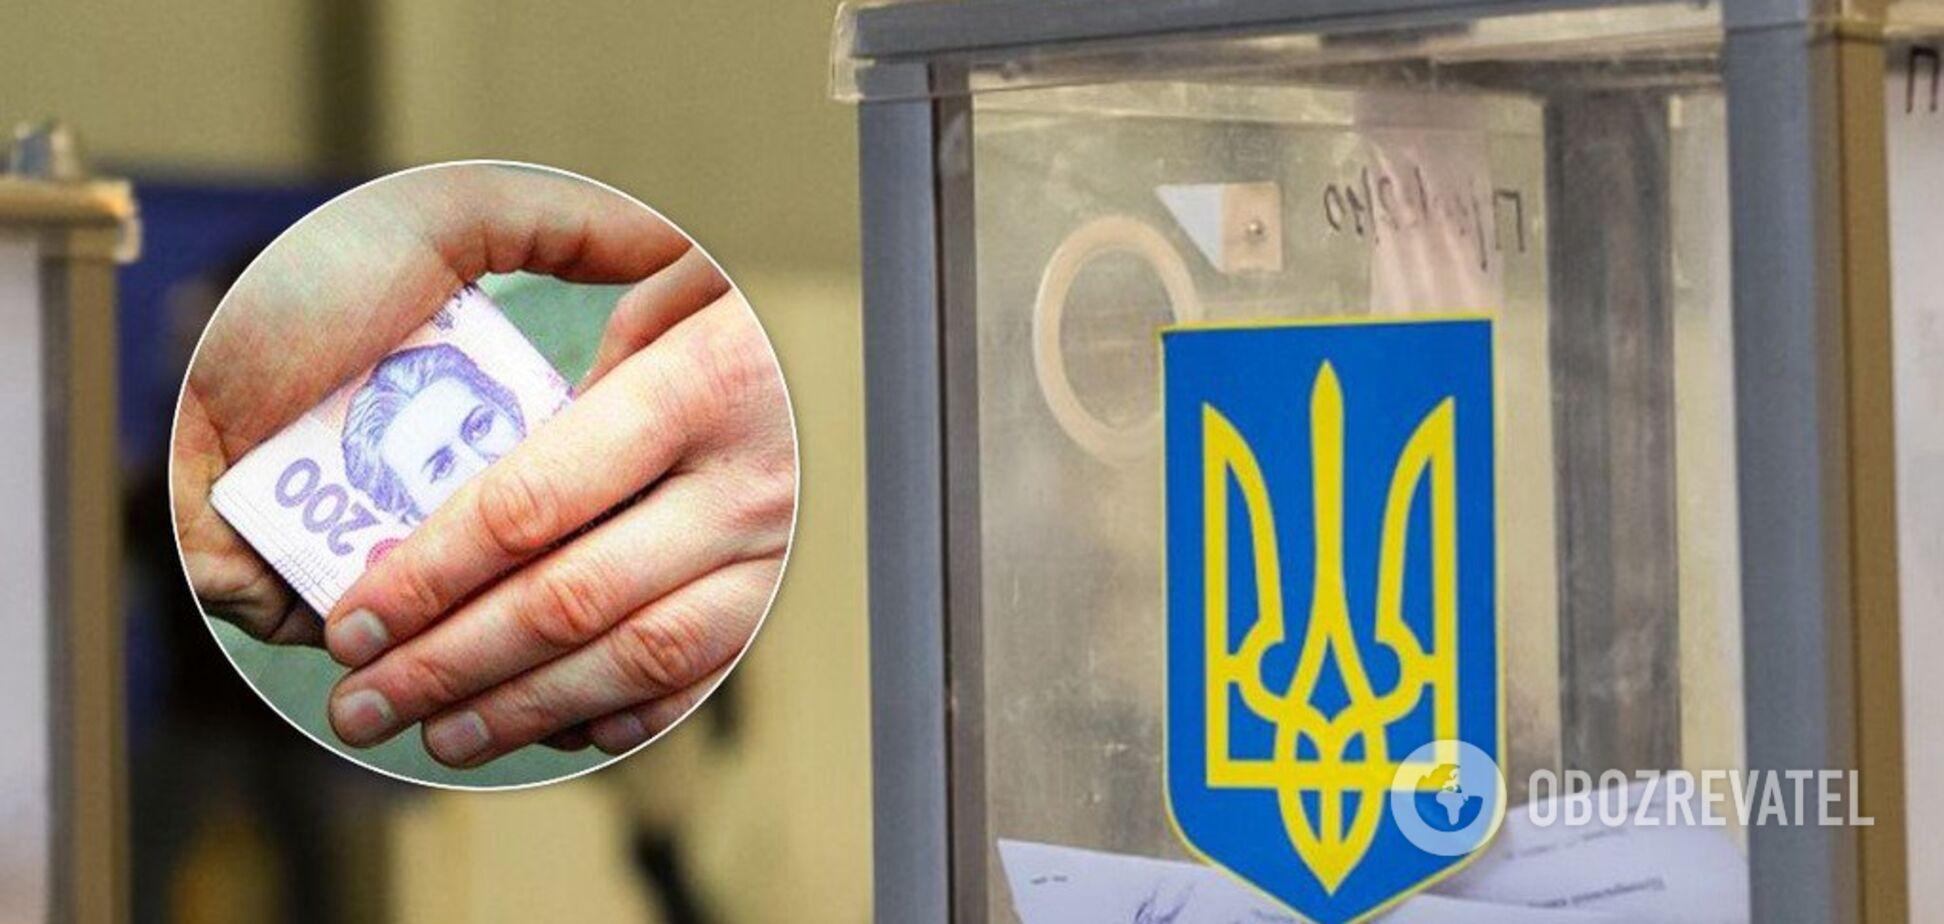 Из-за подкупа избирателей: на Киевщине объявили о подозрении мэру города